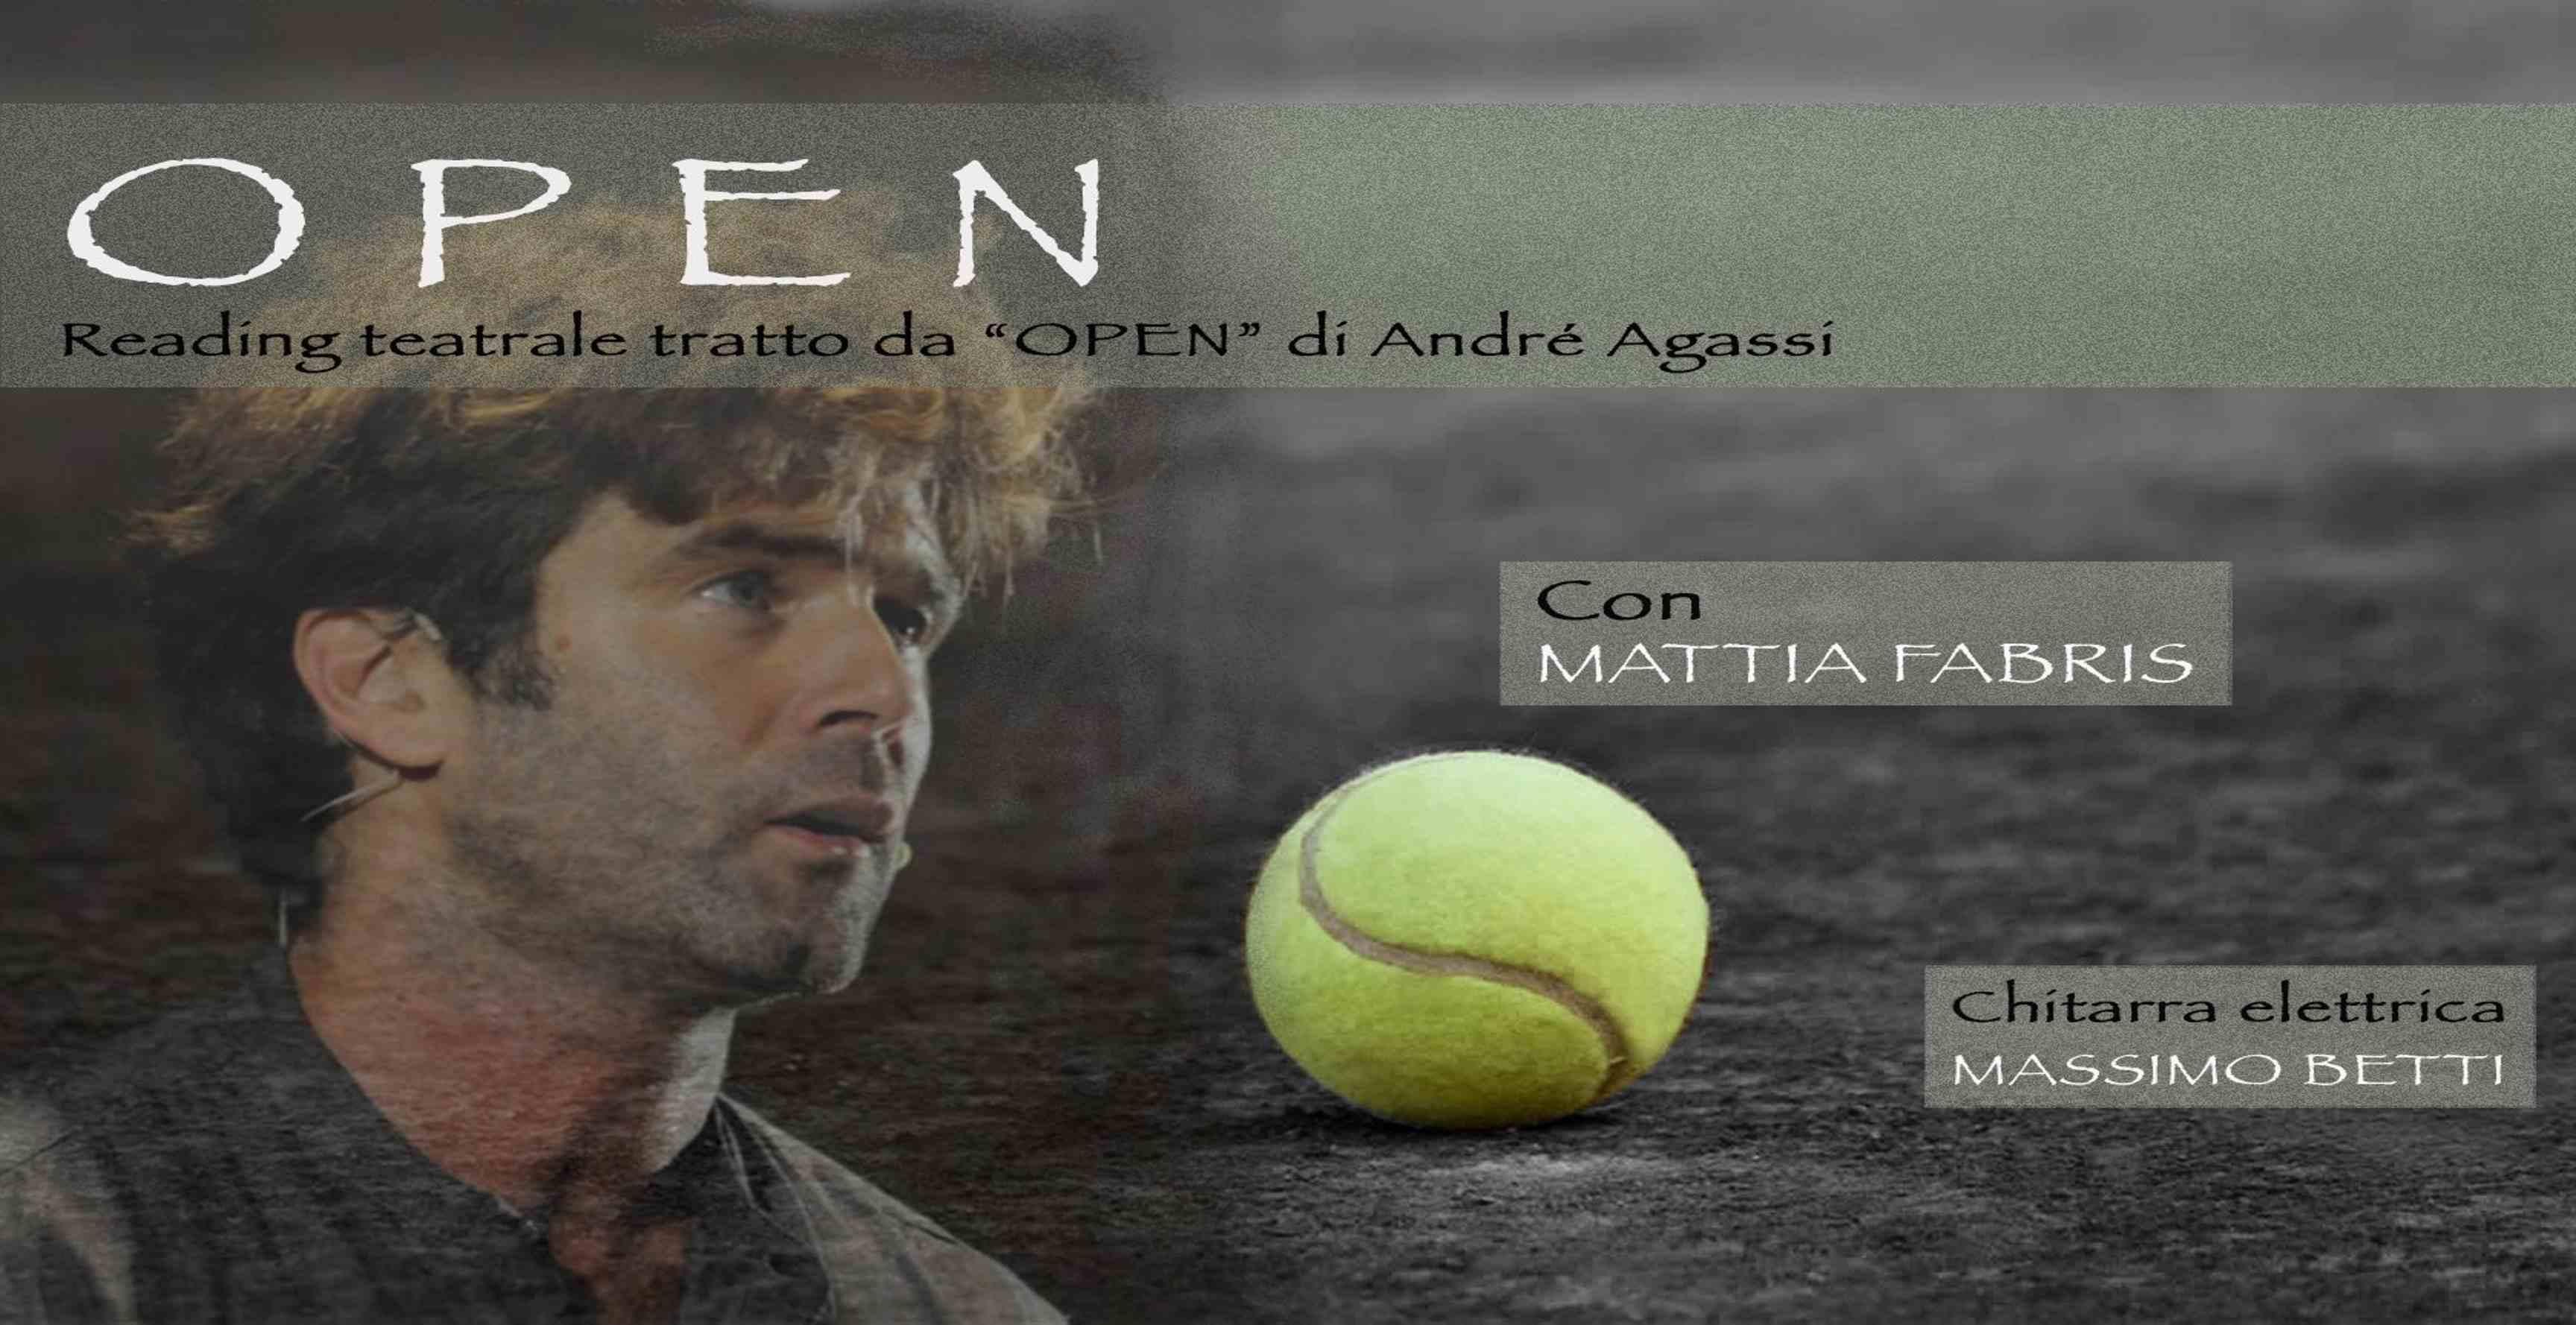 Tennis_MattiaFabris_Open_sportmentalcoach_teatro